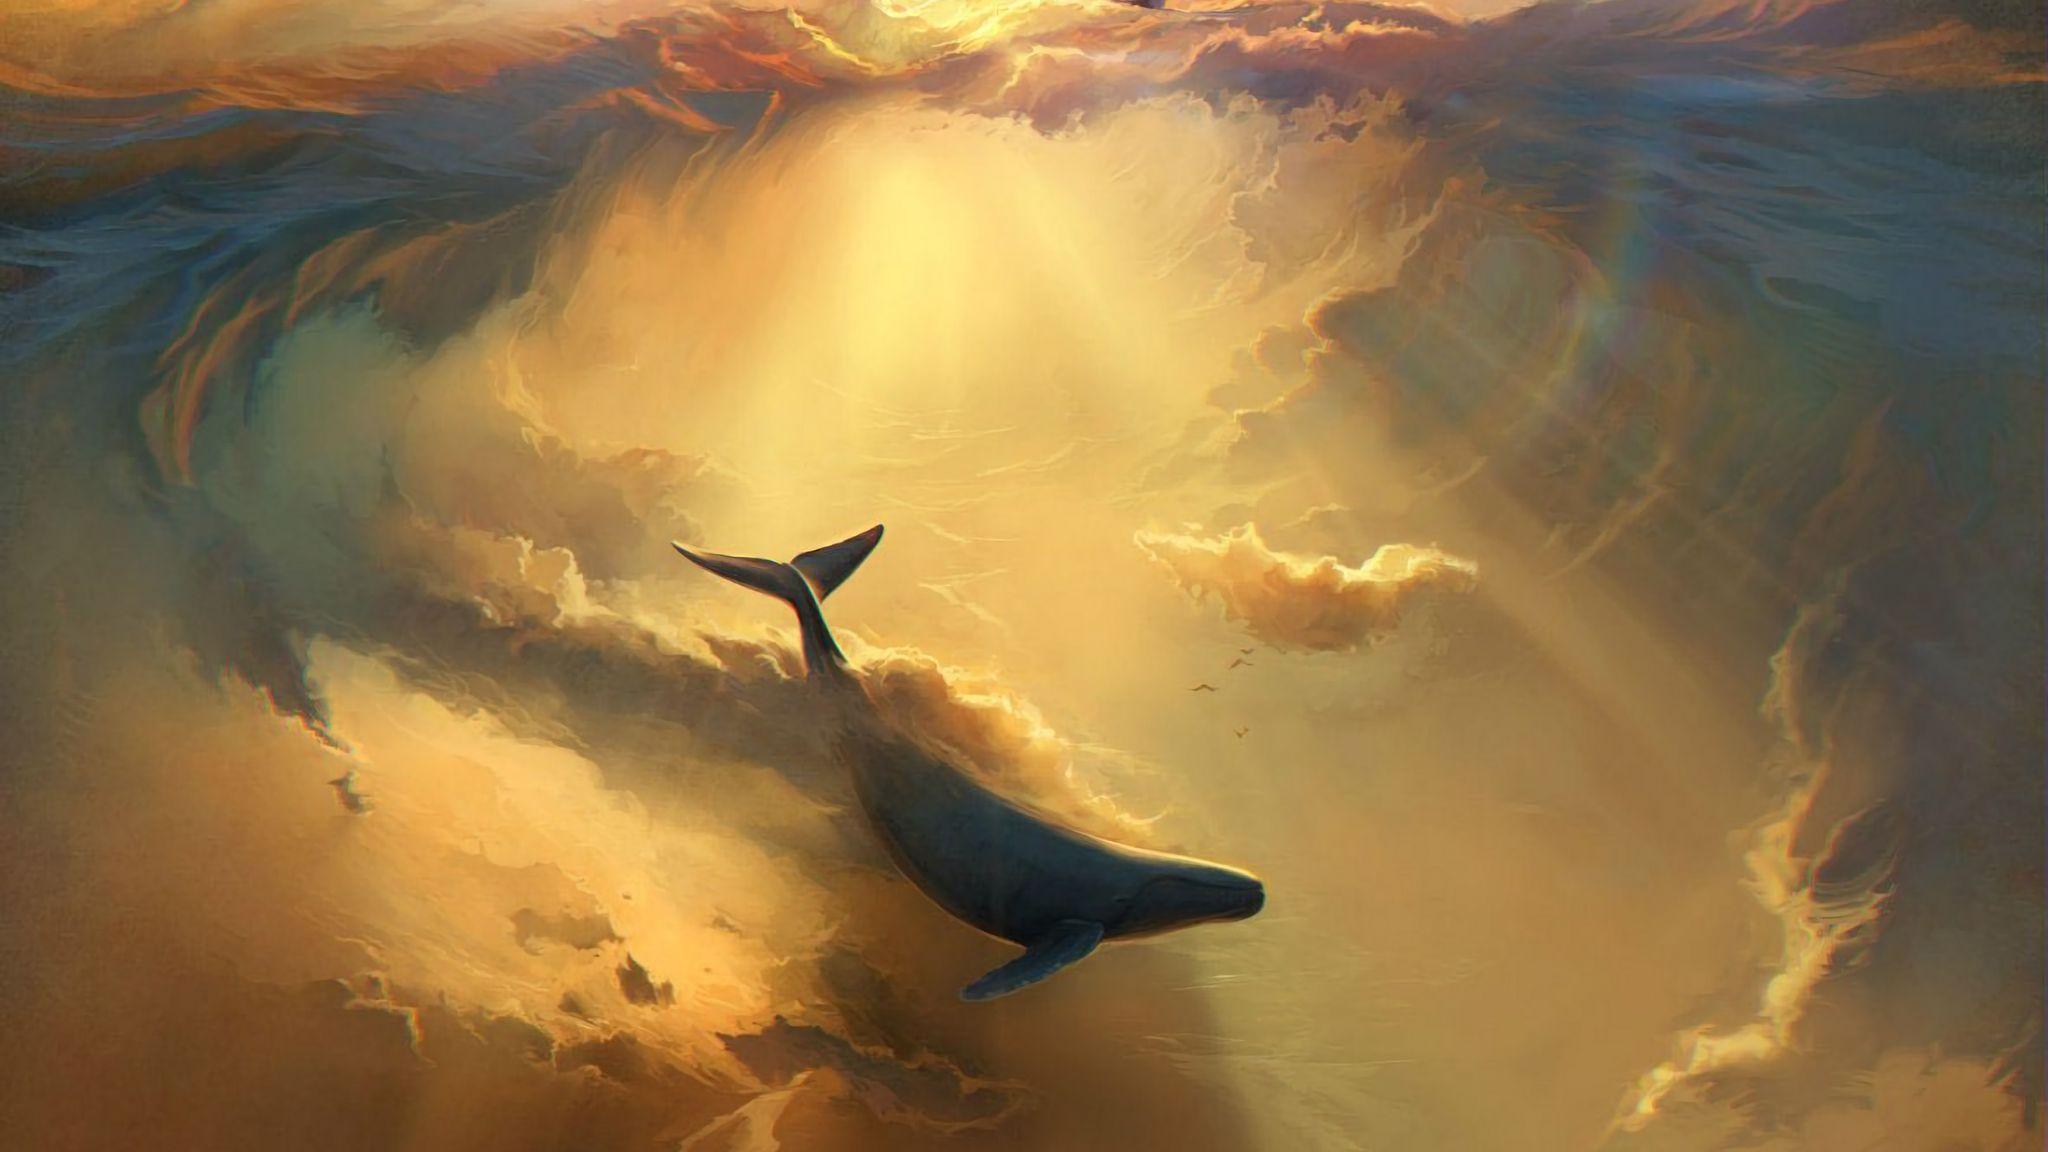 2048x1152 Wallpaper shark, dolphin, sea, art, underwater world